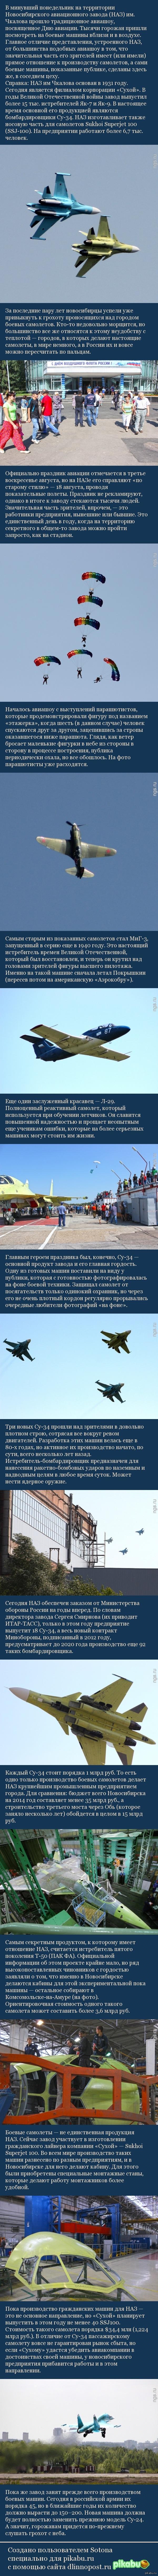 Авиашоу в Новосибирске Не моё, взято с новостного сайта Новосибирска